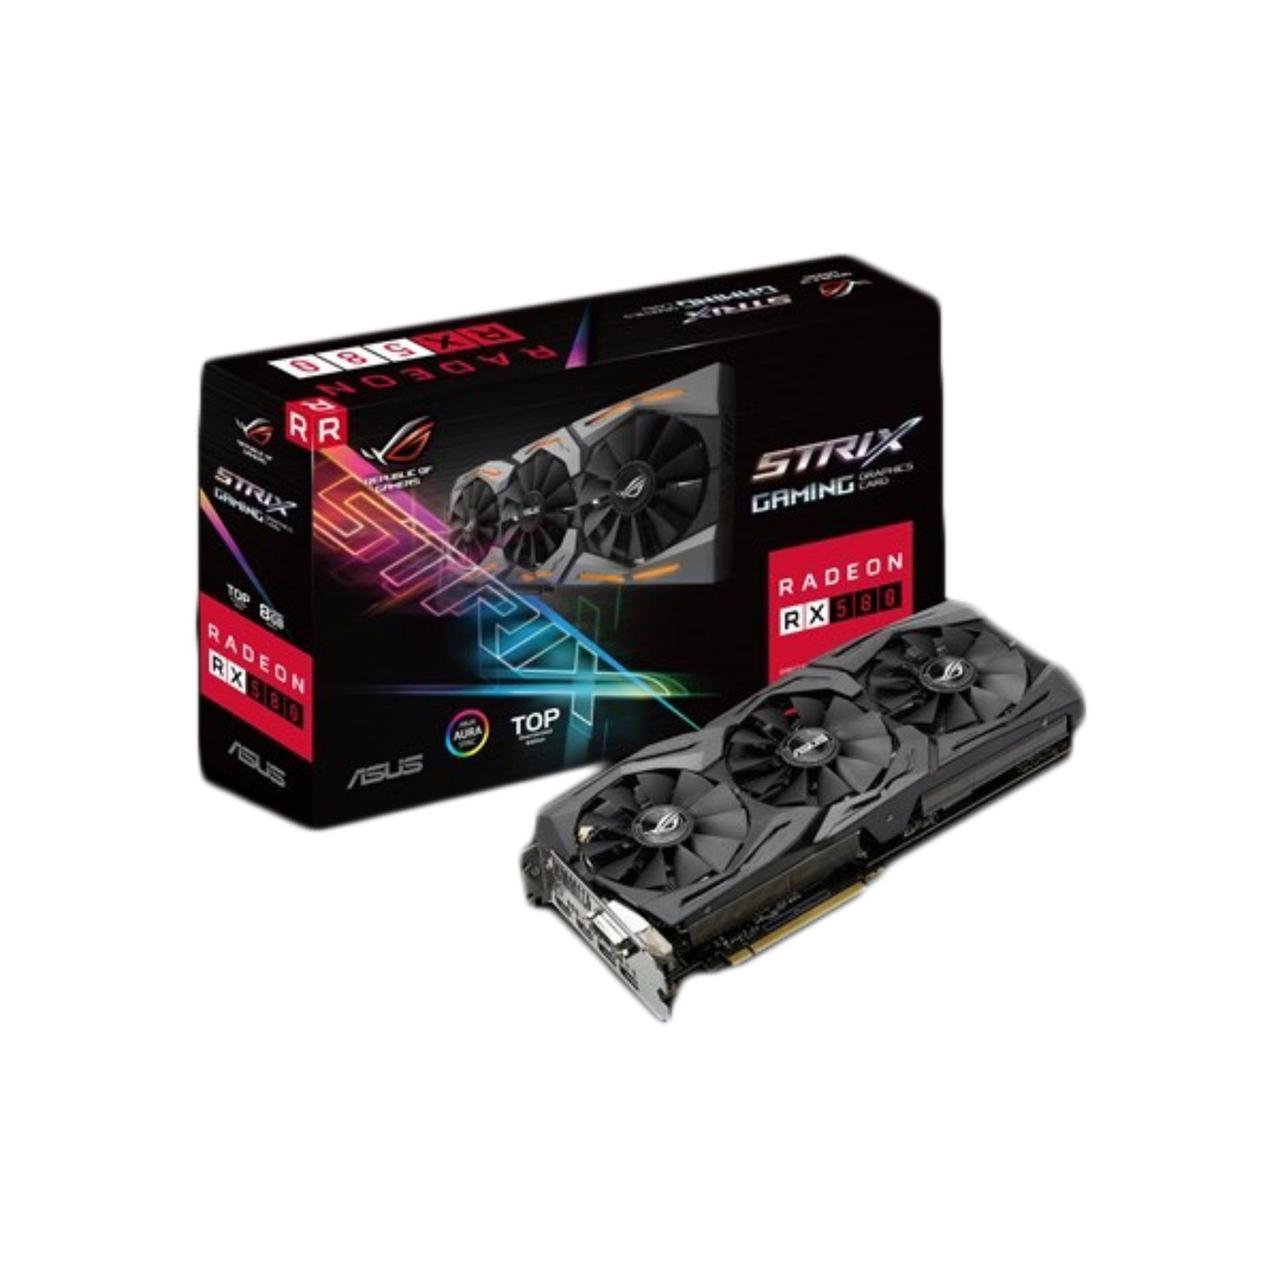 Видеокарта Asus Radeon RX 580 ROG Strix (ROG-STRIX-RX580-T8G-GAMING)